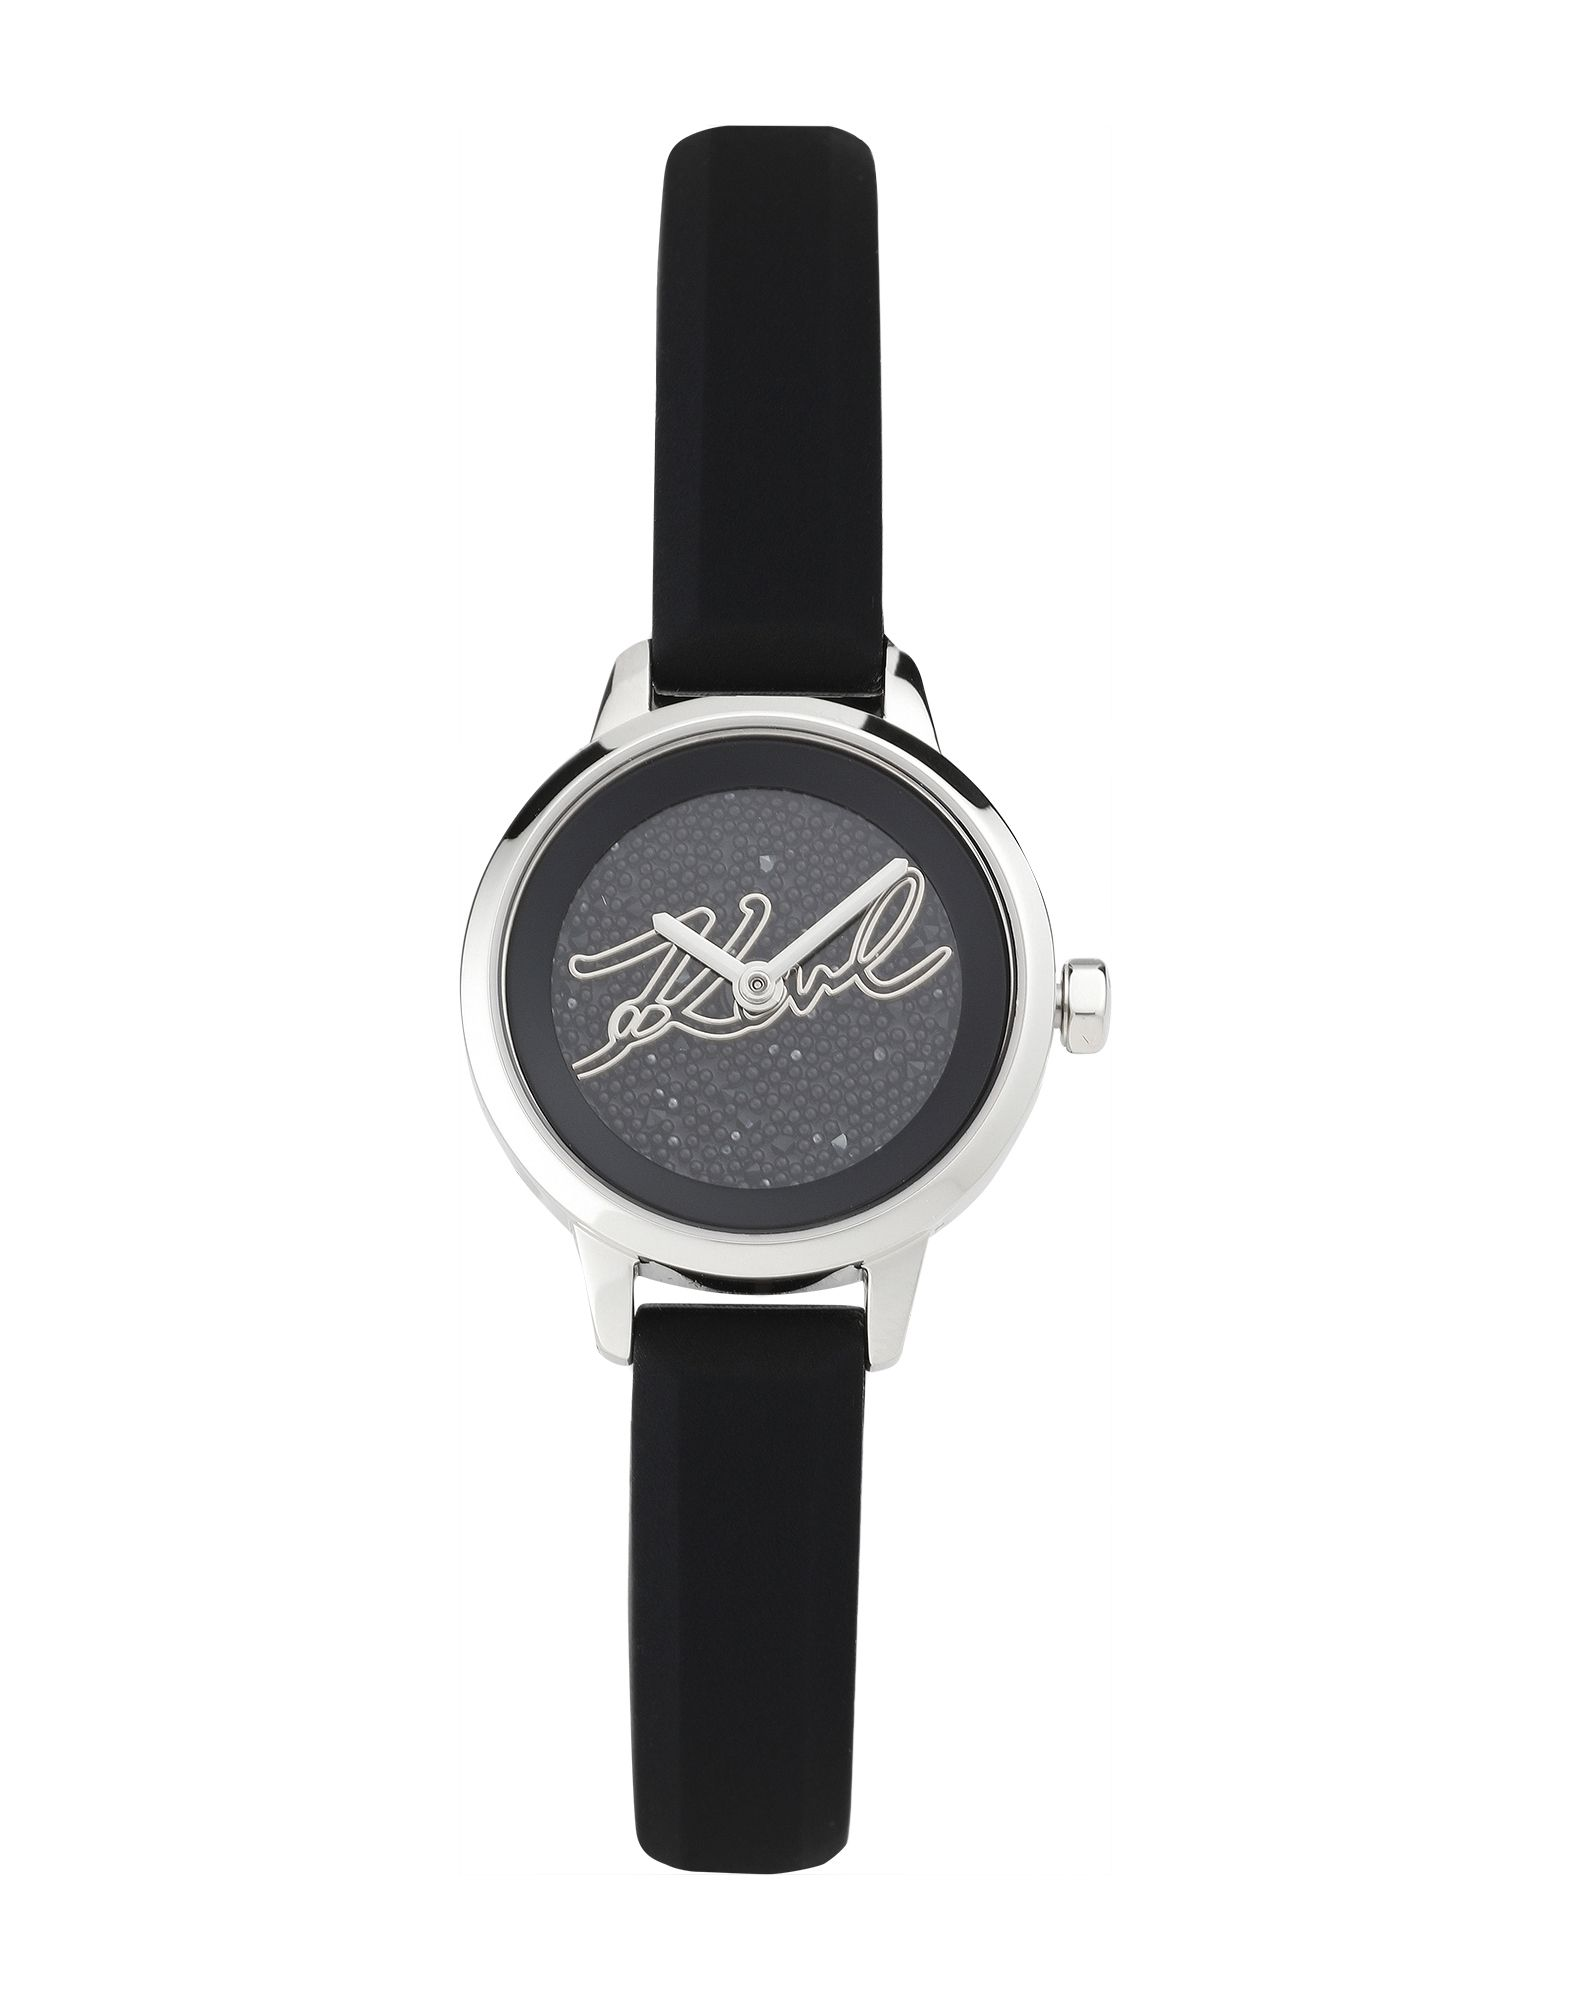 KARL LAGERFELD Wrist watches - Item 58049283